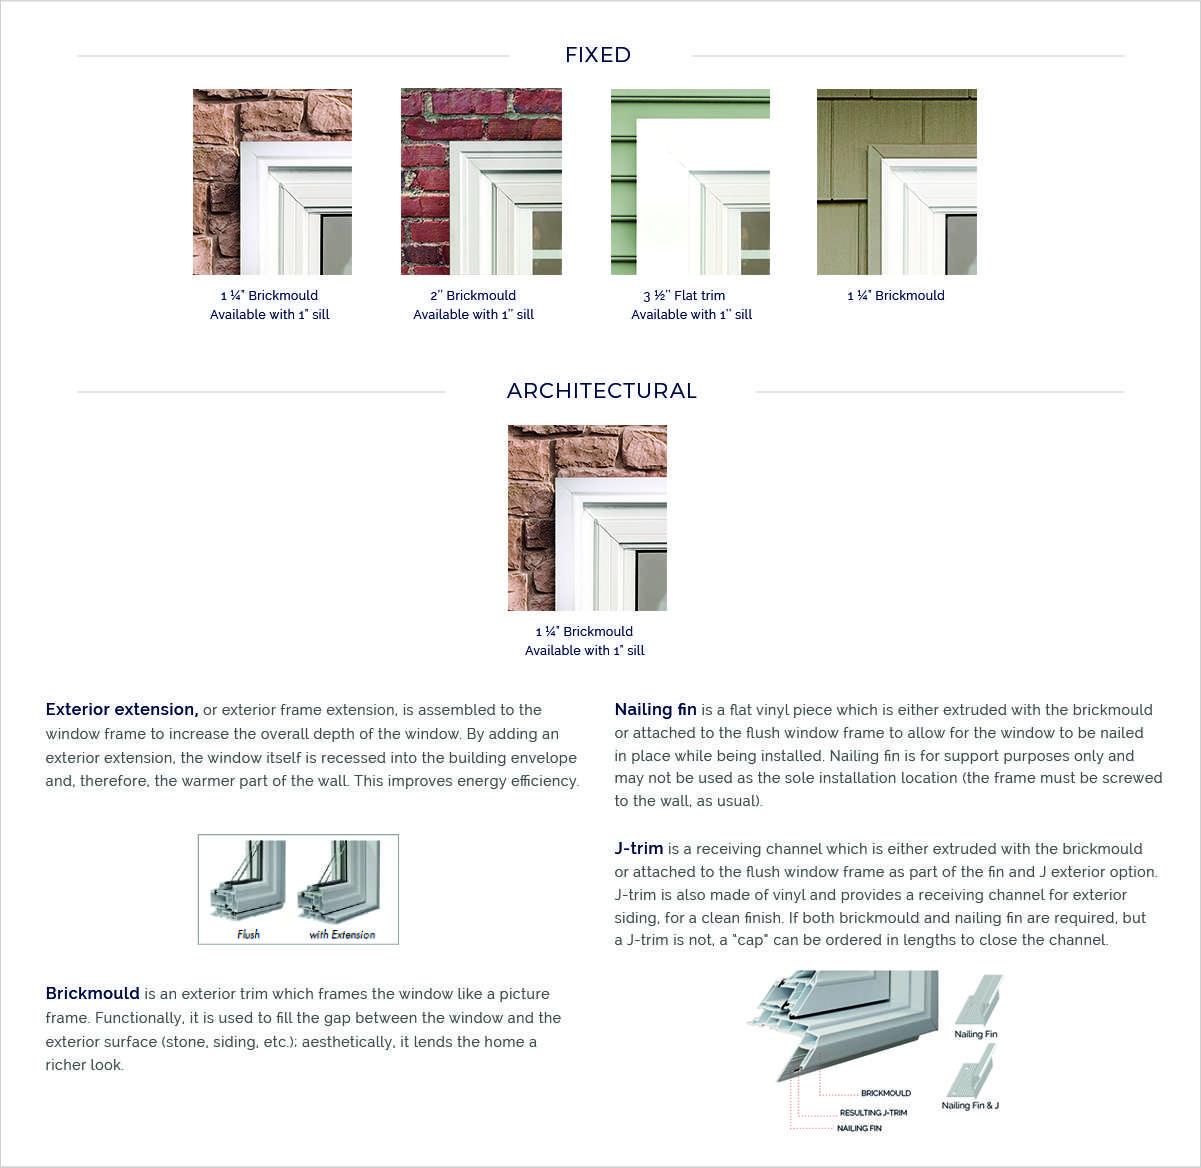 exterior options